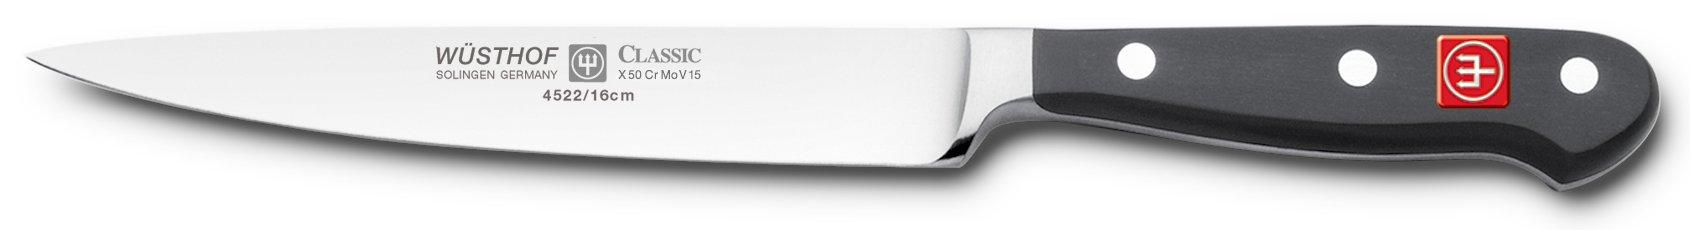 Wusthof Classic 6-Inch Utility Knife by Wüsthof